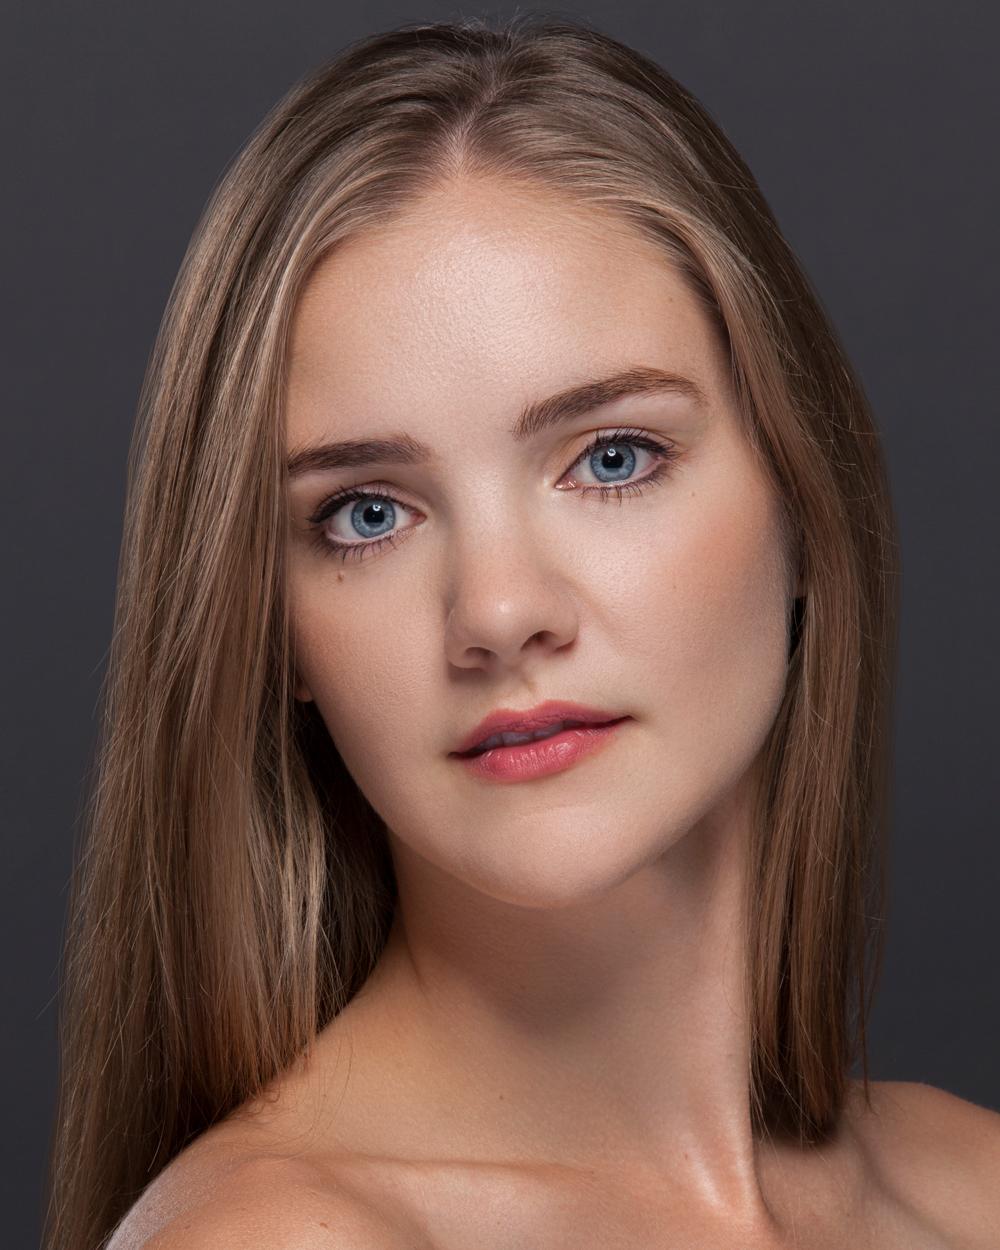 Paige-Adams